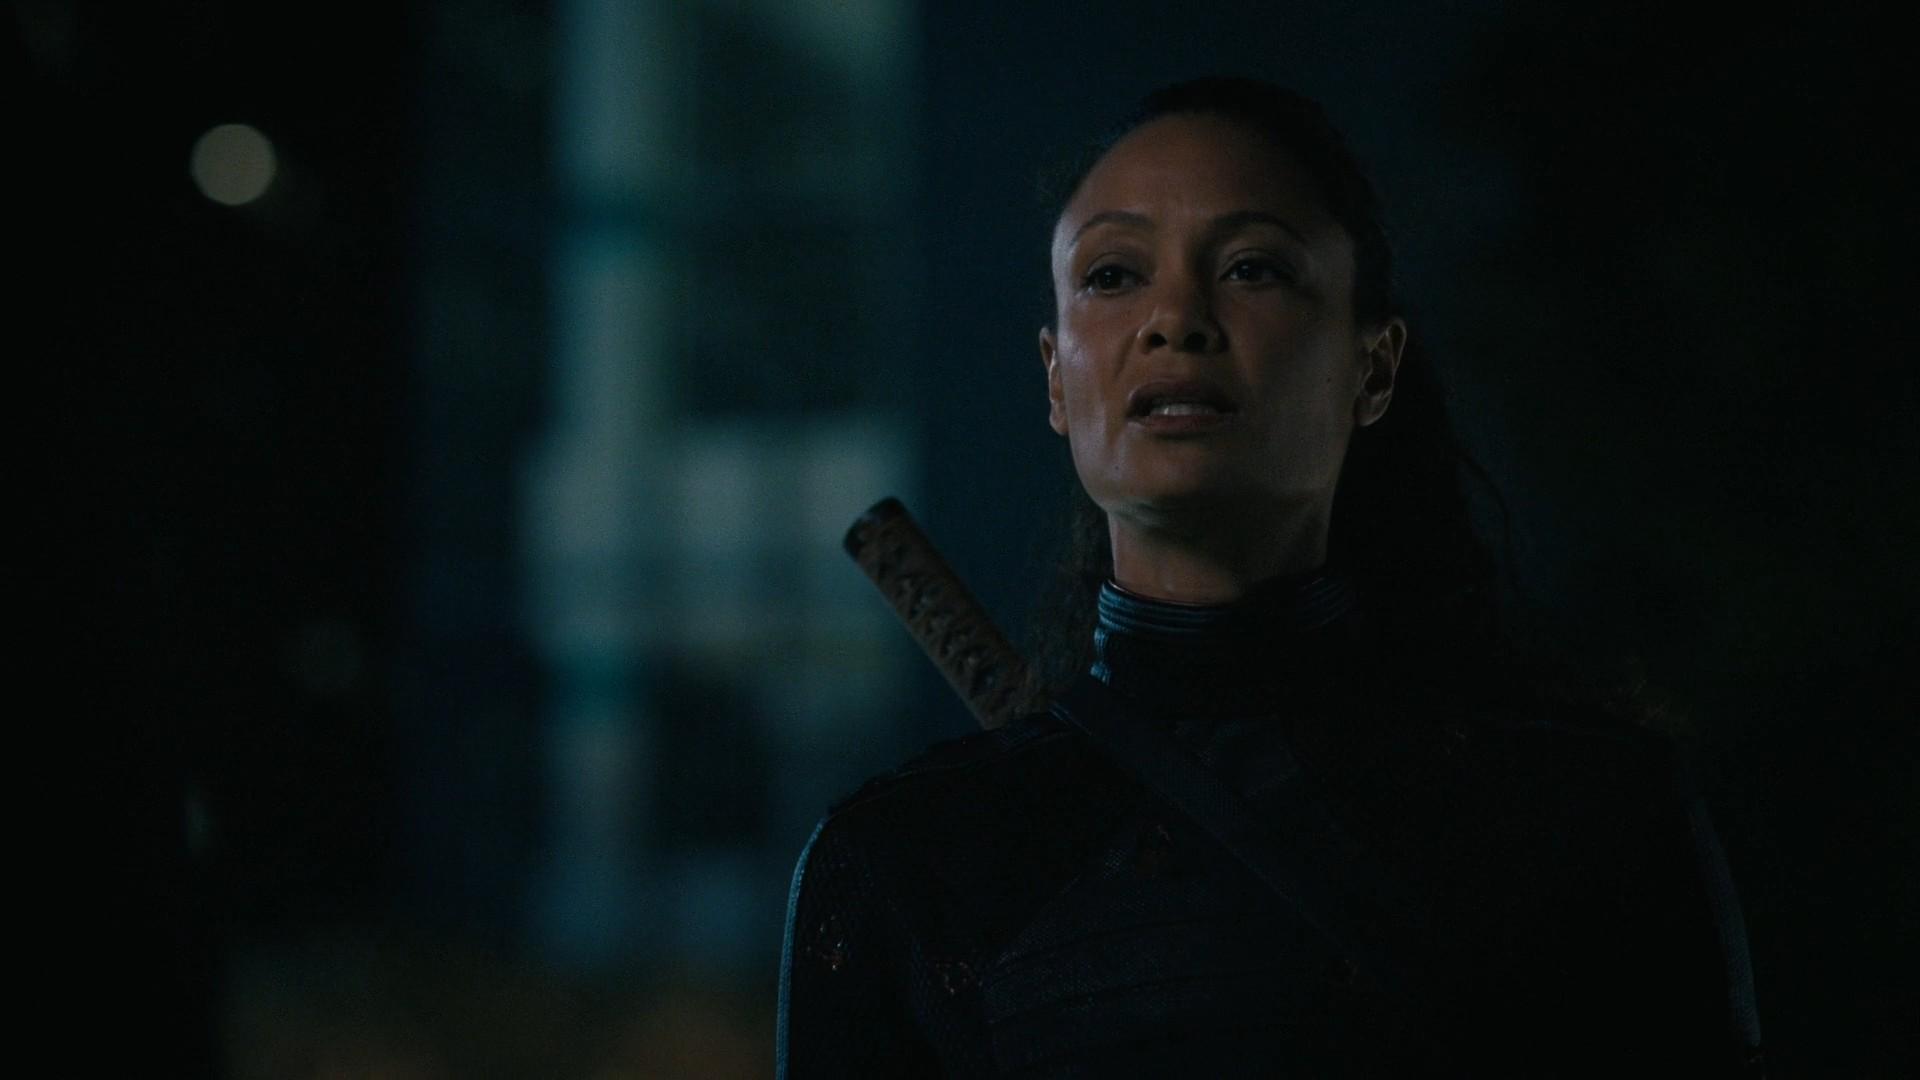 Westworld S03E08 Crisis Theory - Maeve